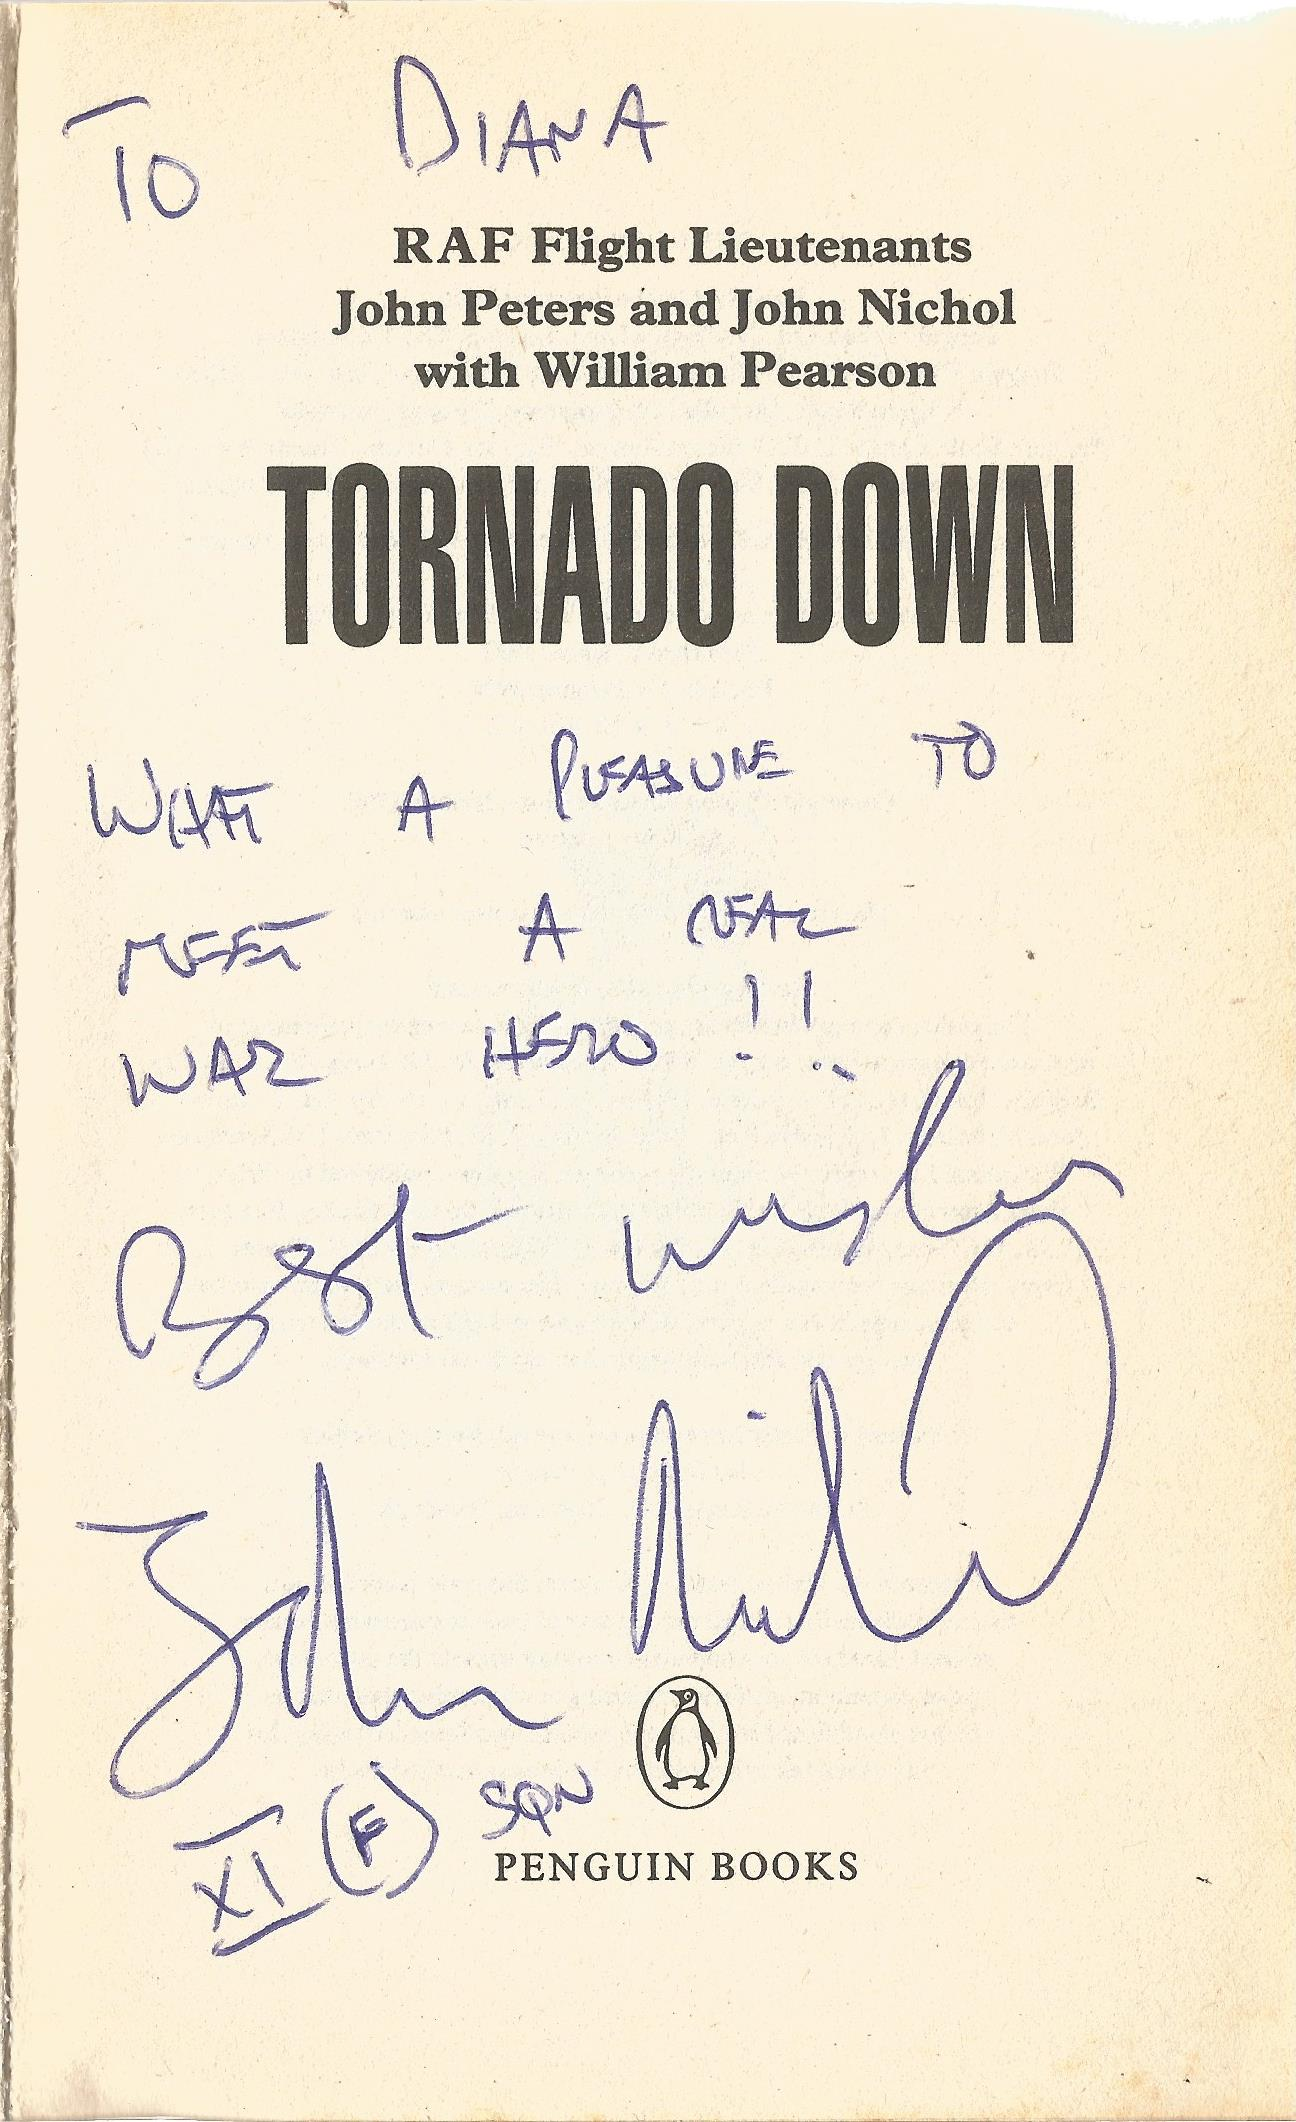 RAF Flight Lieutenants John Peters and John Nichol Paperback Book Tornado Down signed by John Nichol - Image 2 of 3